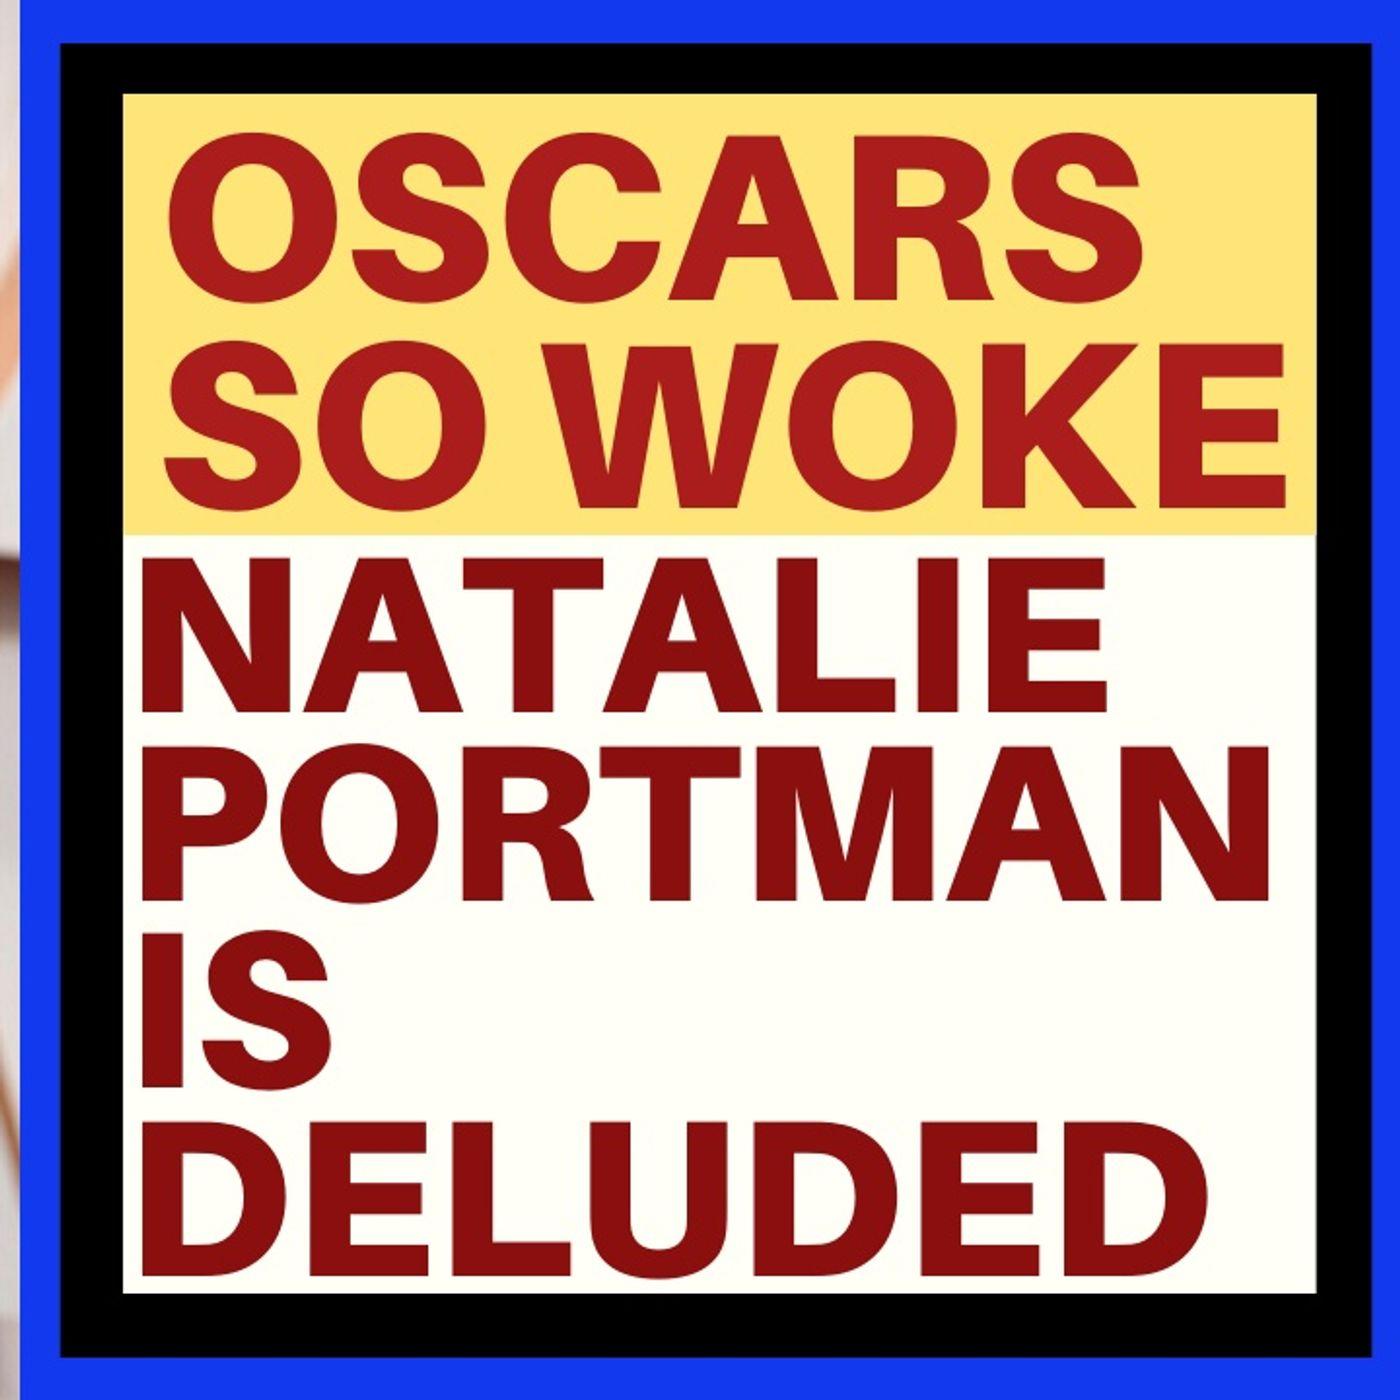 NATALIE PORTMAN'S RIDICULOUS WOKE OSCAR STATEMENT